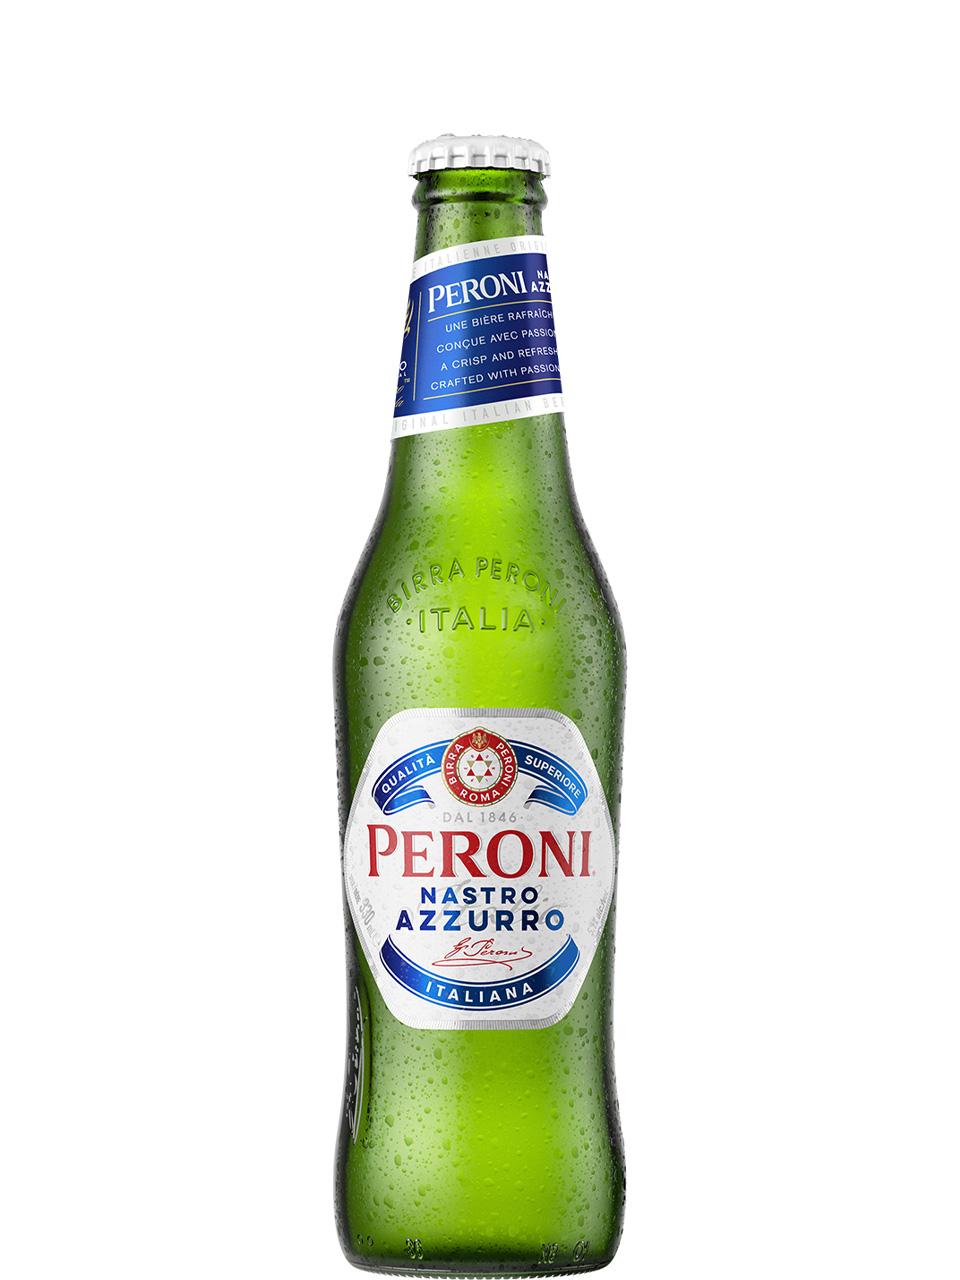 Peroni Nastro Azzurro 6 Pack Bottles